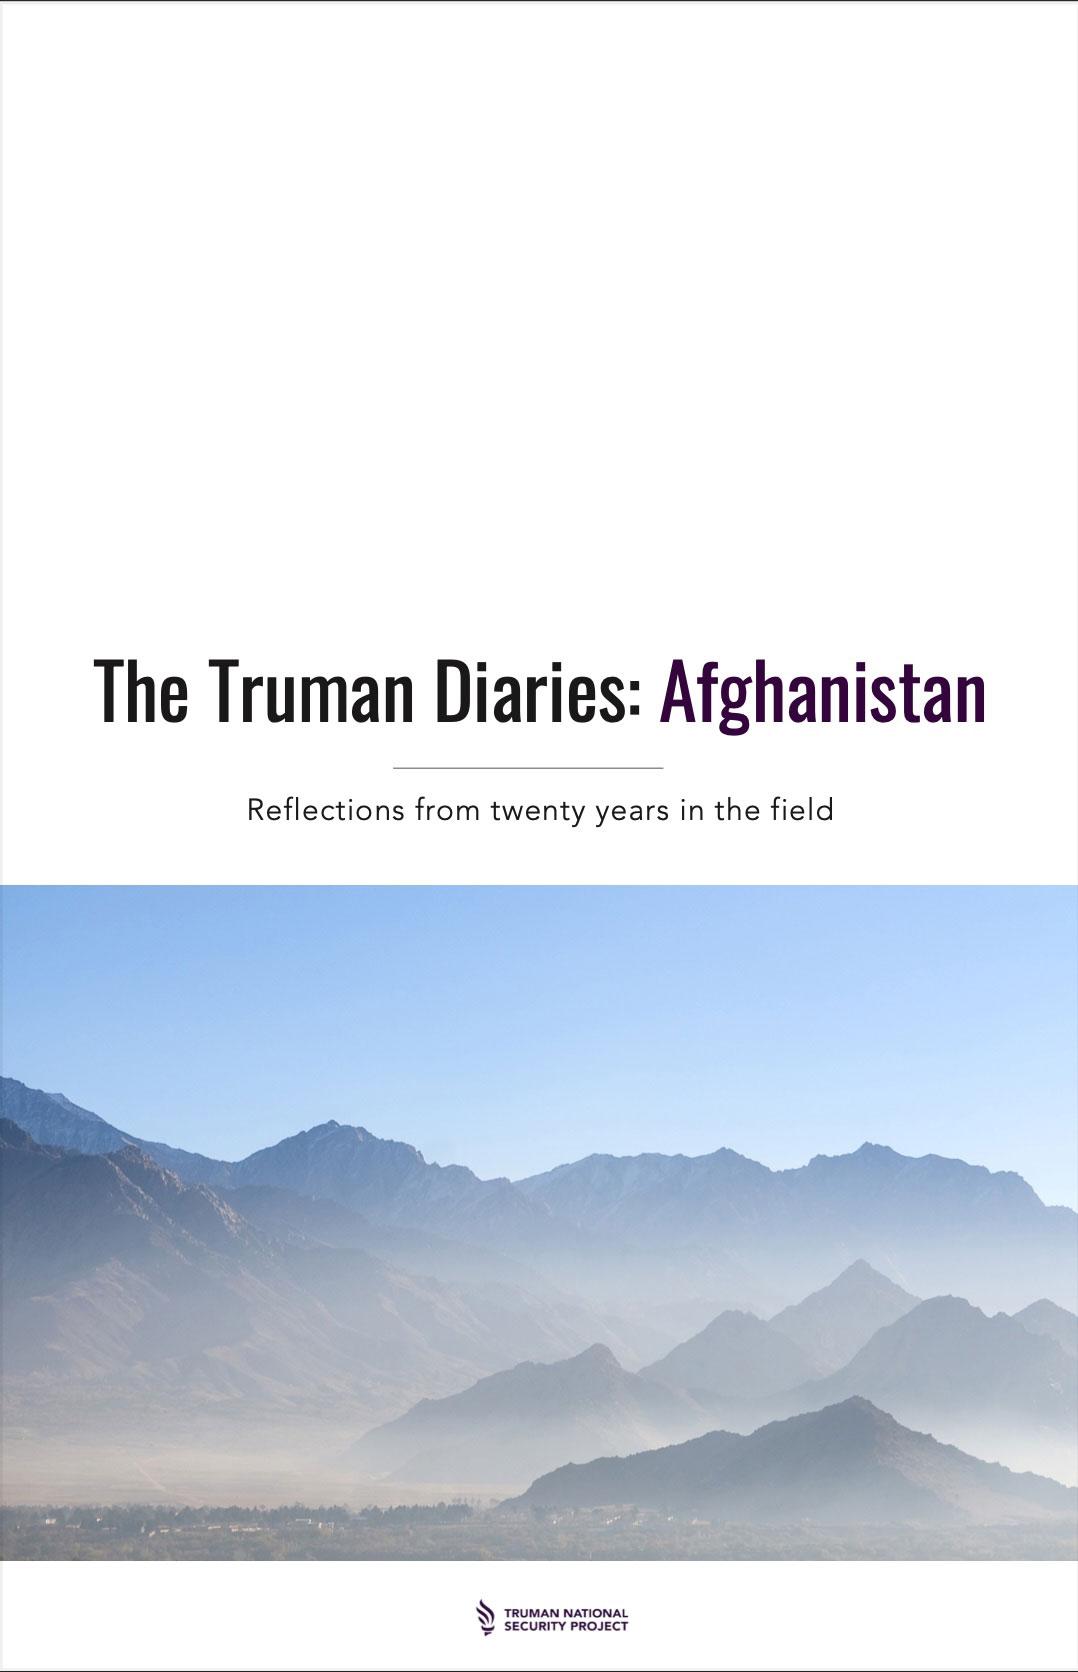 The Truman Diaries: Afghanistan